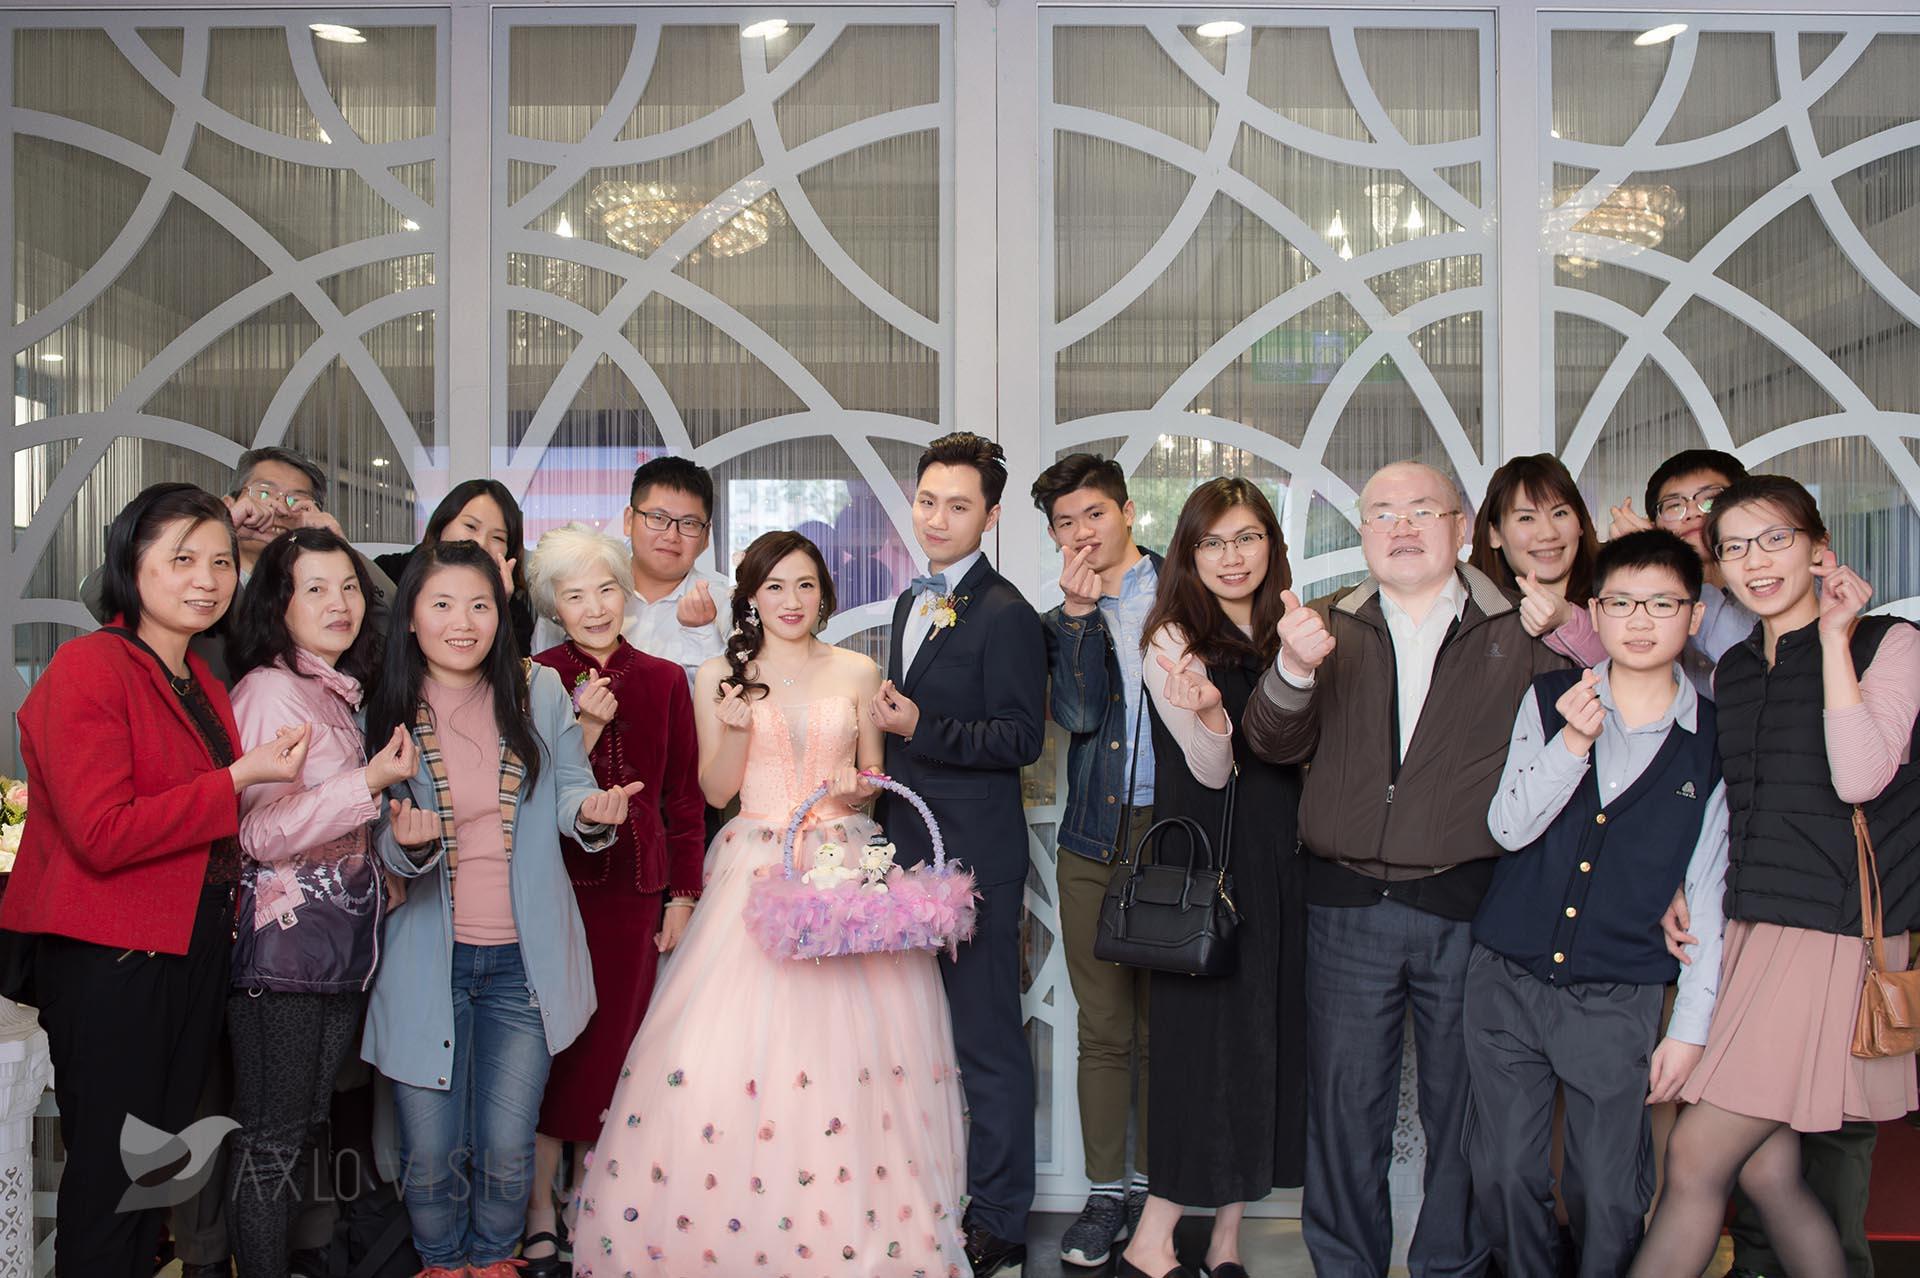 WeddingDay20170401A_276